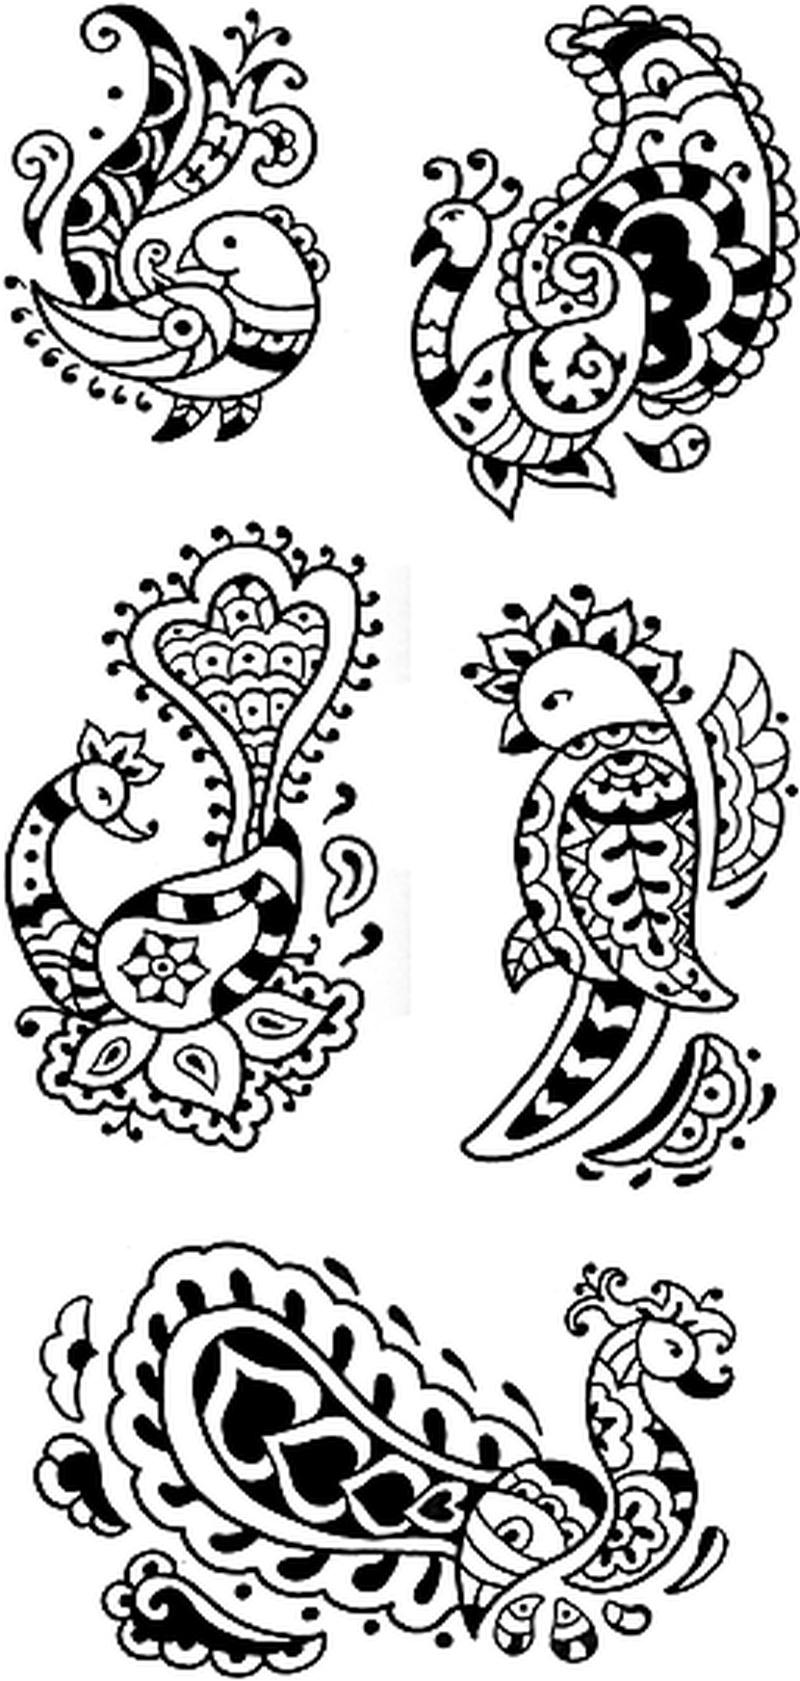 Henna Birds Raven Dove Swallow Eagle Tattoo Designs - Tattoos Book - Free Printable Henna Tattoo Designs